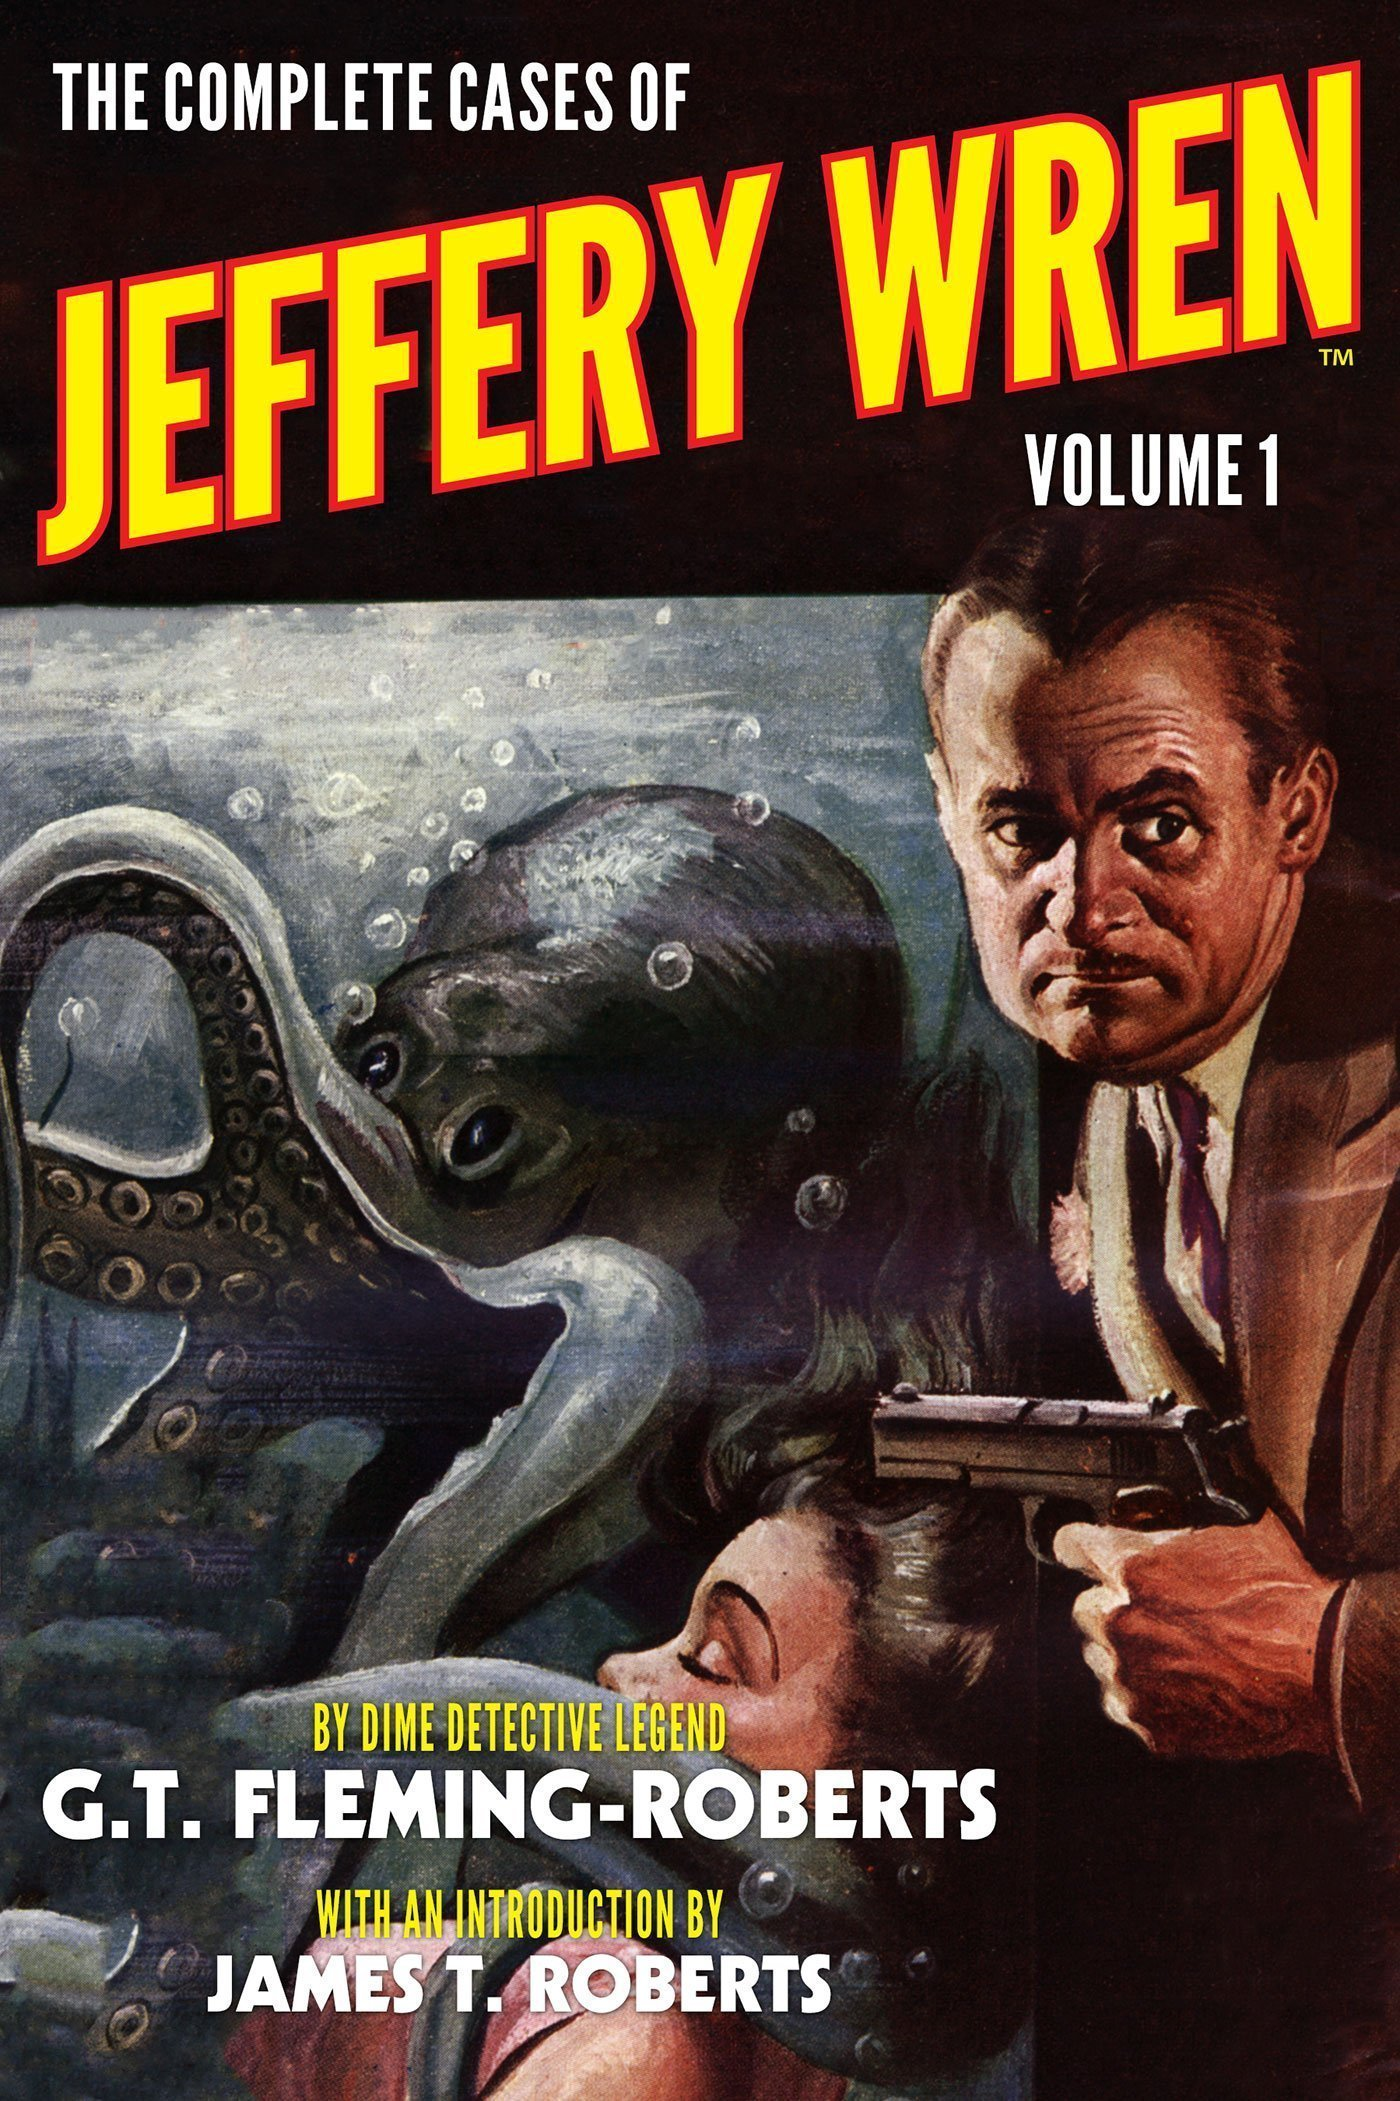 The Complete Cases of Jeffery Wren, Volume 1 - Dime Detective